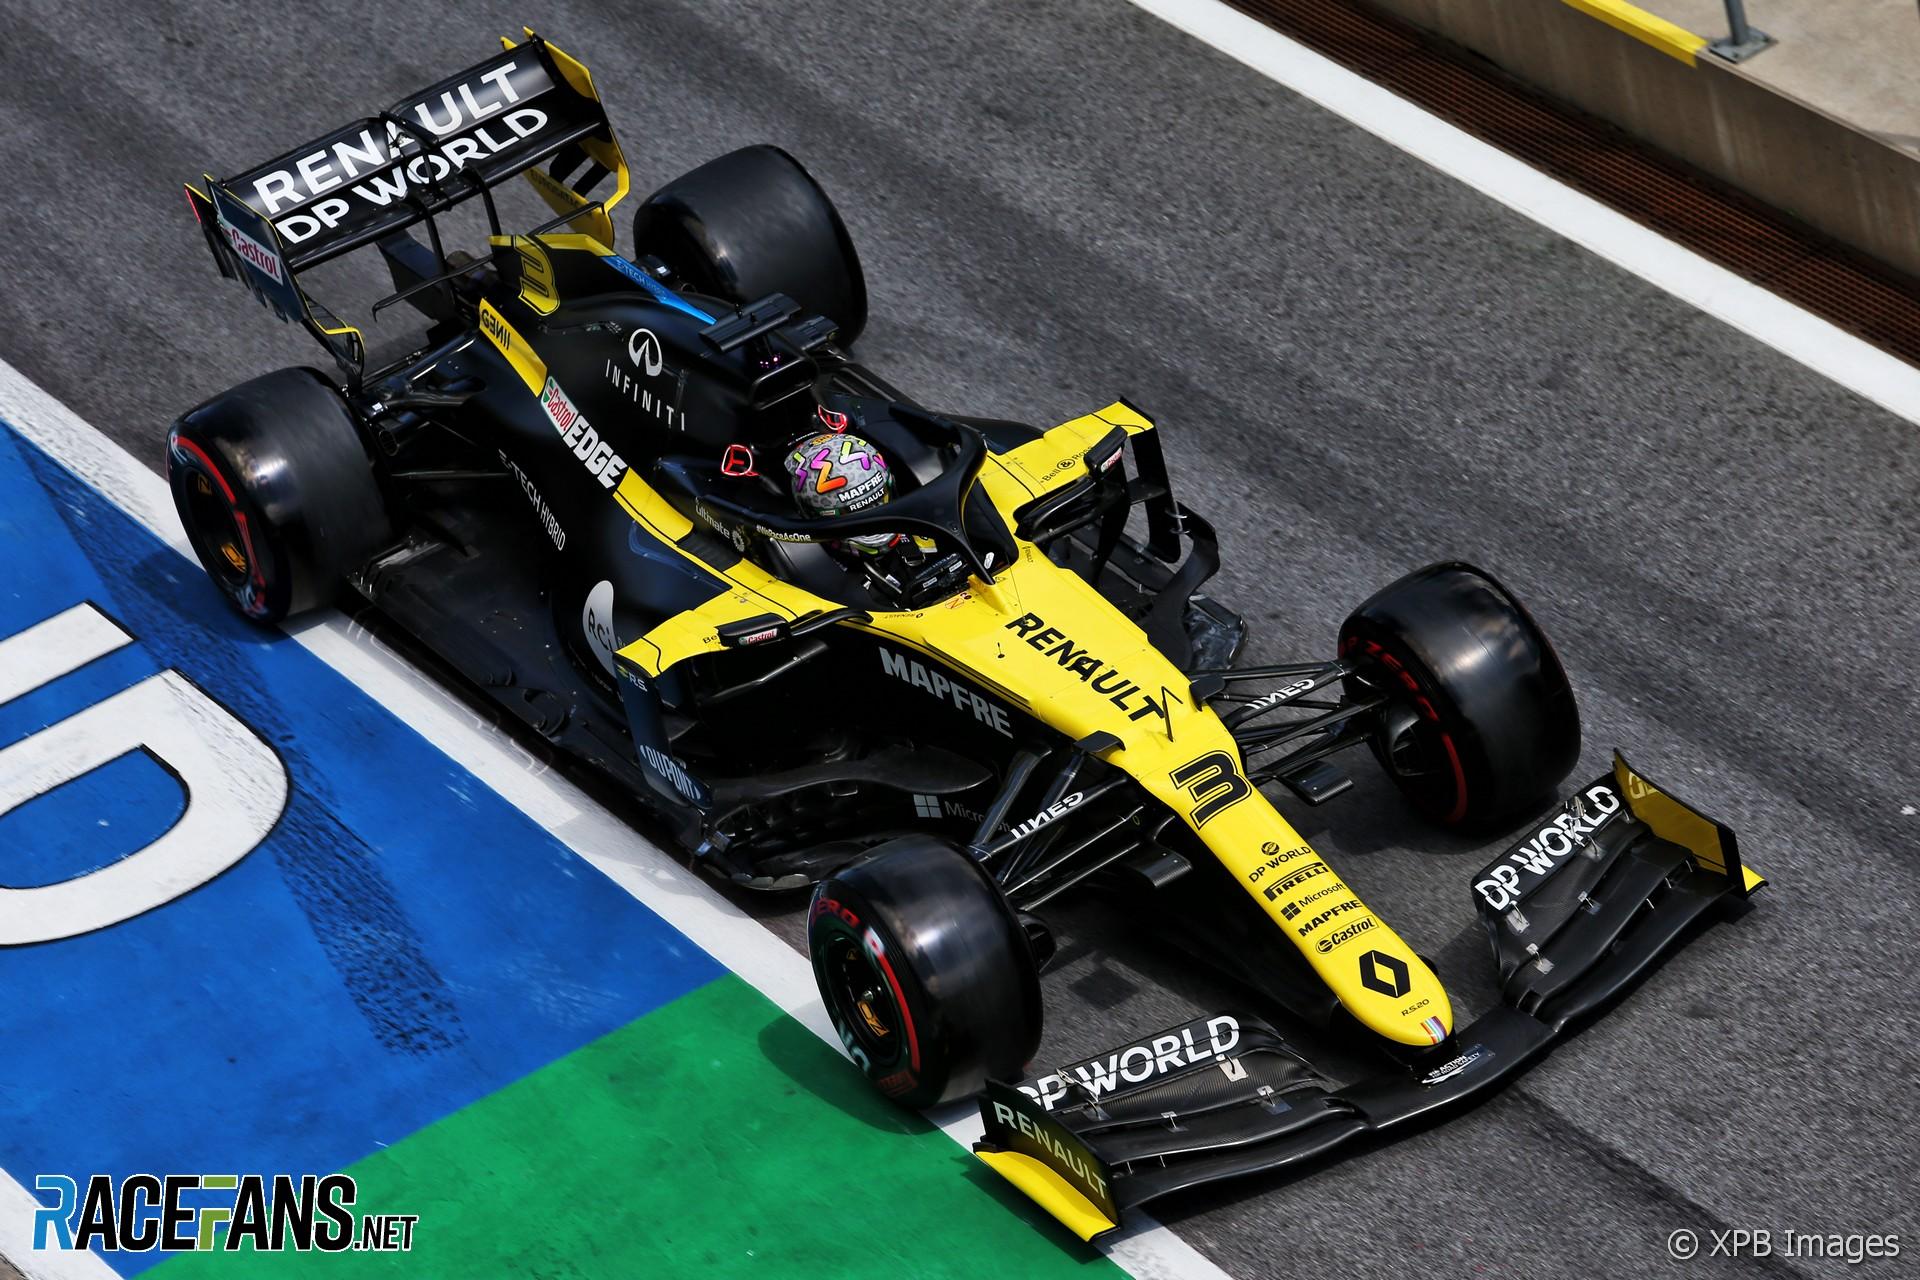 Daniel Ricciardo Renault Red Bull Ring 2020 Racefans